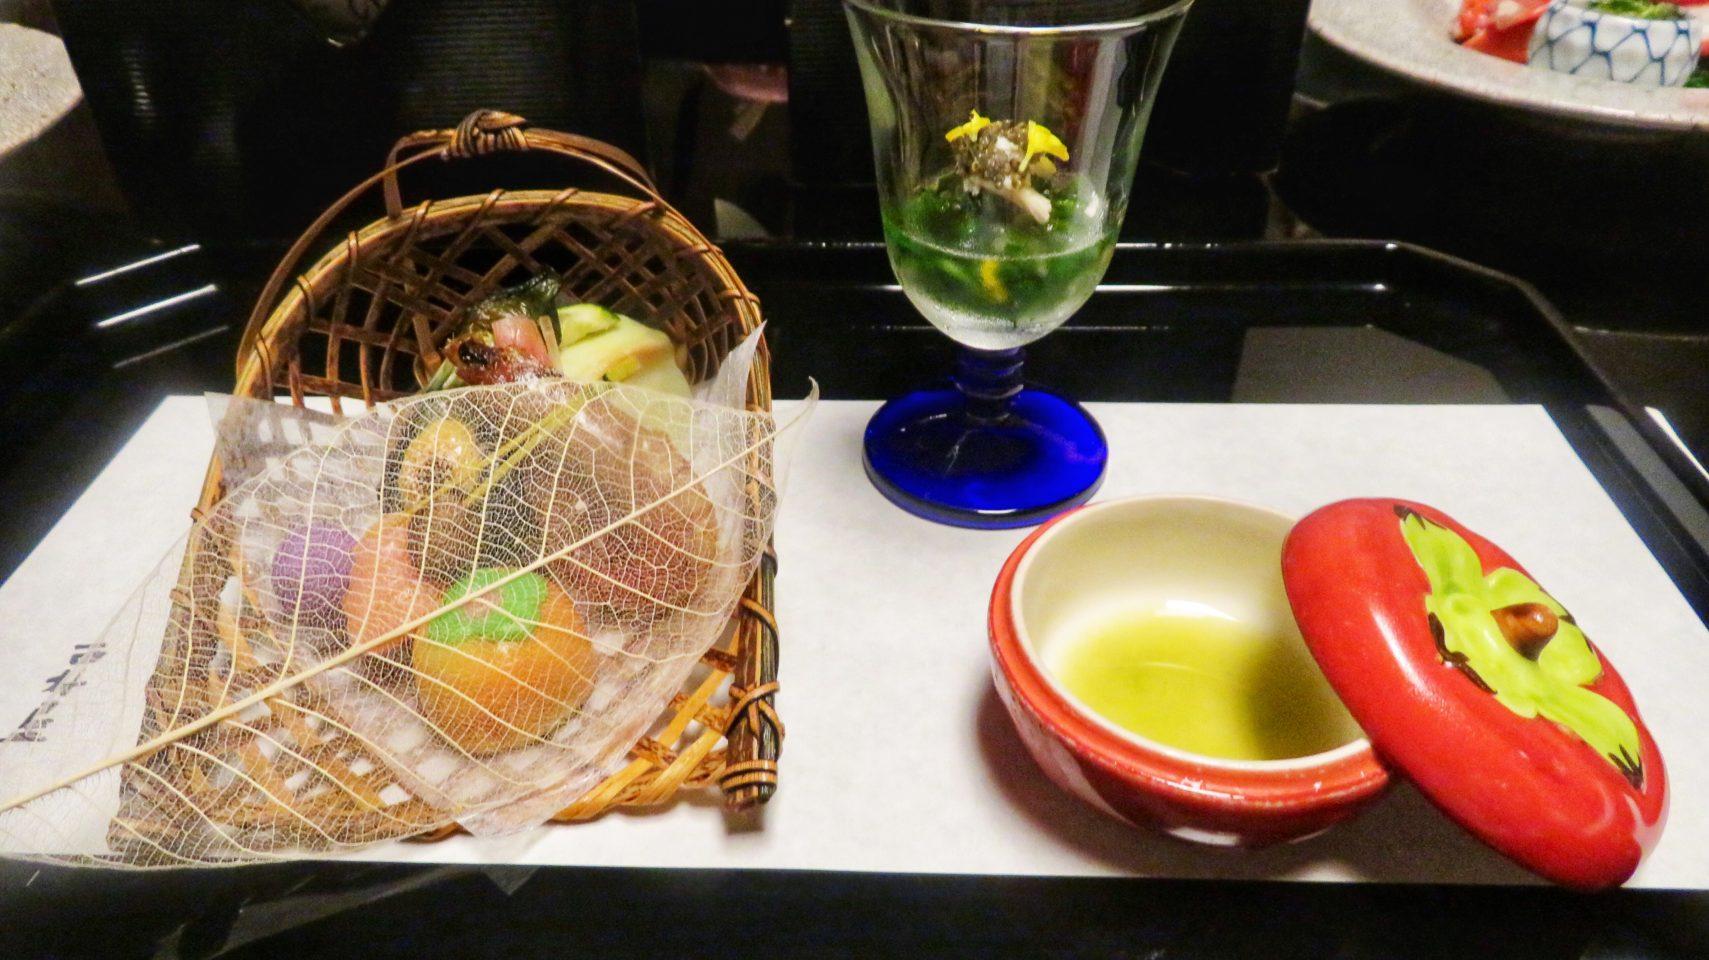 Japan Culinary Experiences ~ The appetizer course of our ten-course kaiseki gourmet dinner at Nishimuraya Honkan ryokan in Kinosaki Onsen